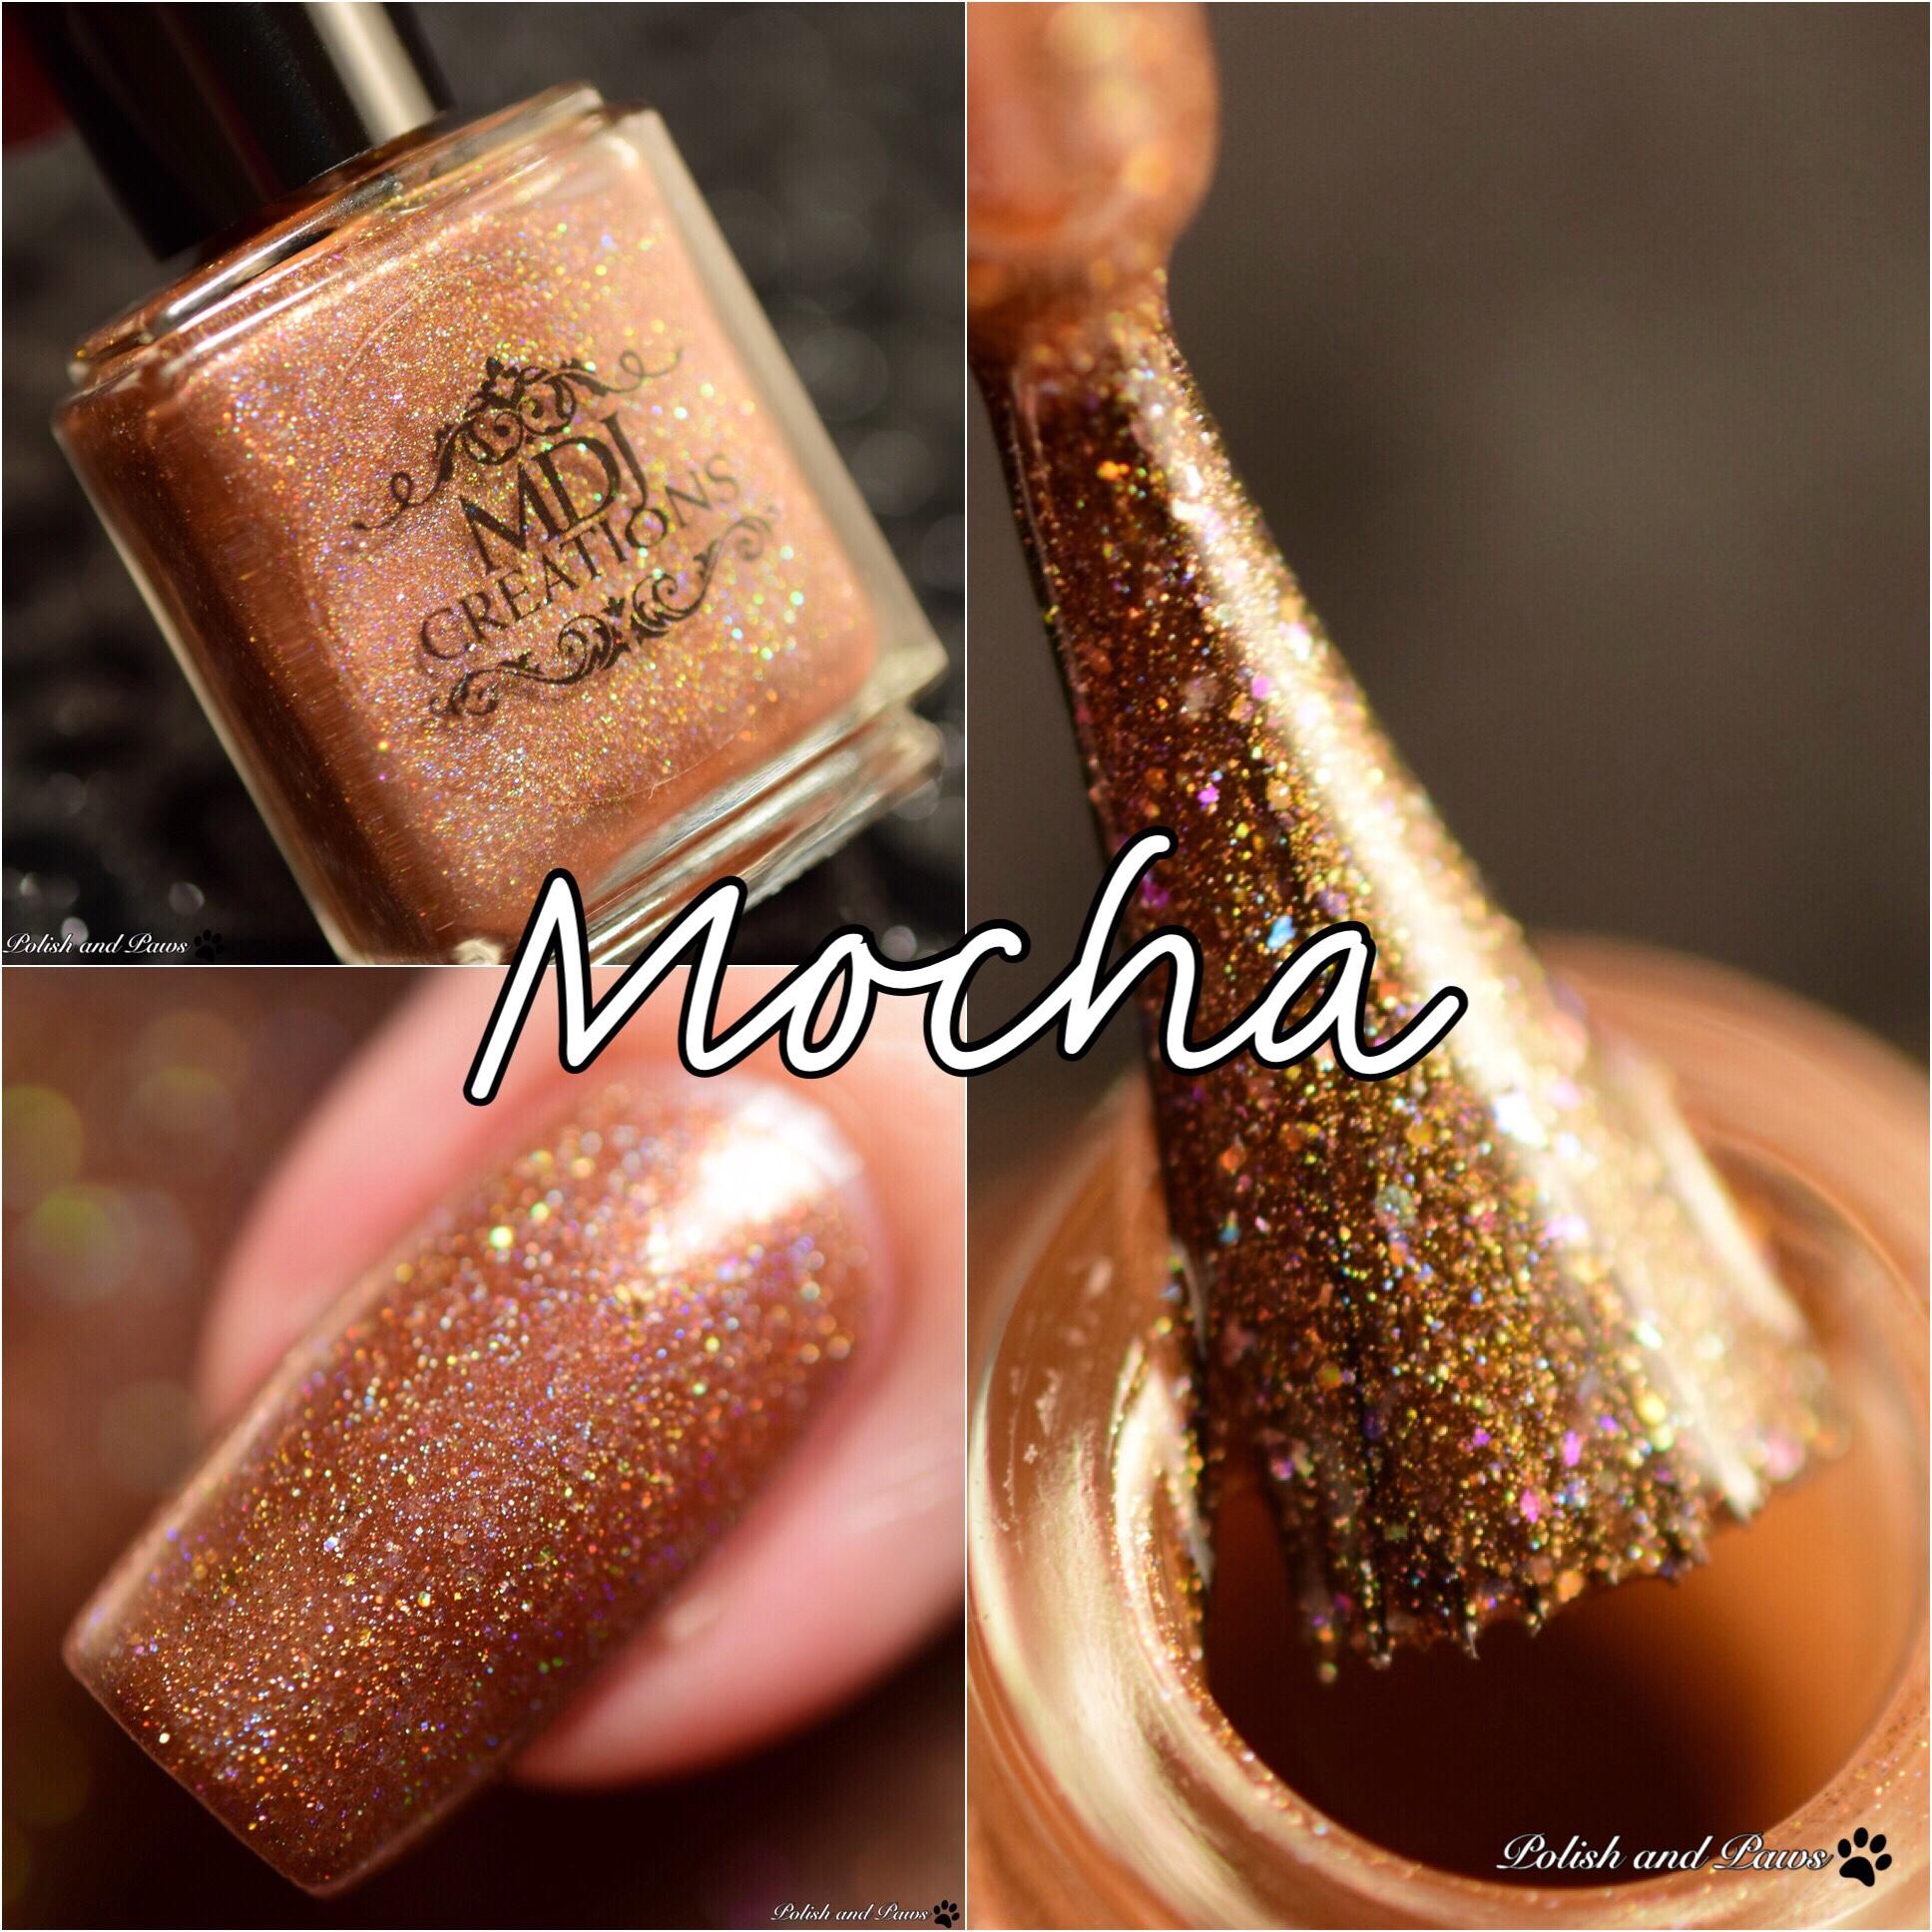 MDJ Creations Mocha